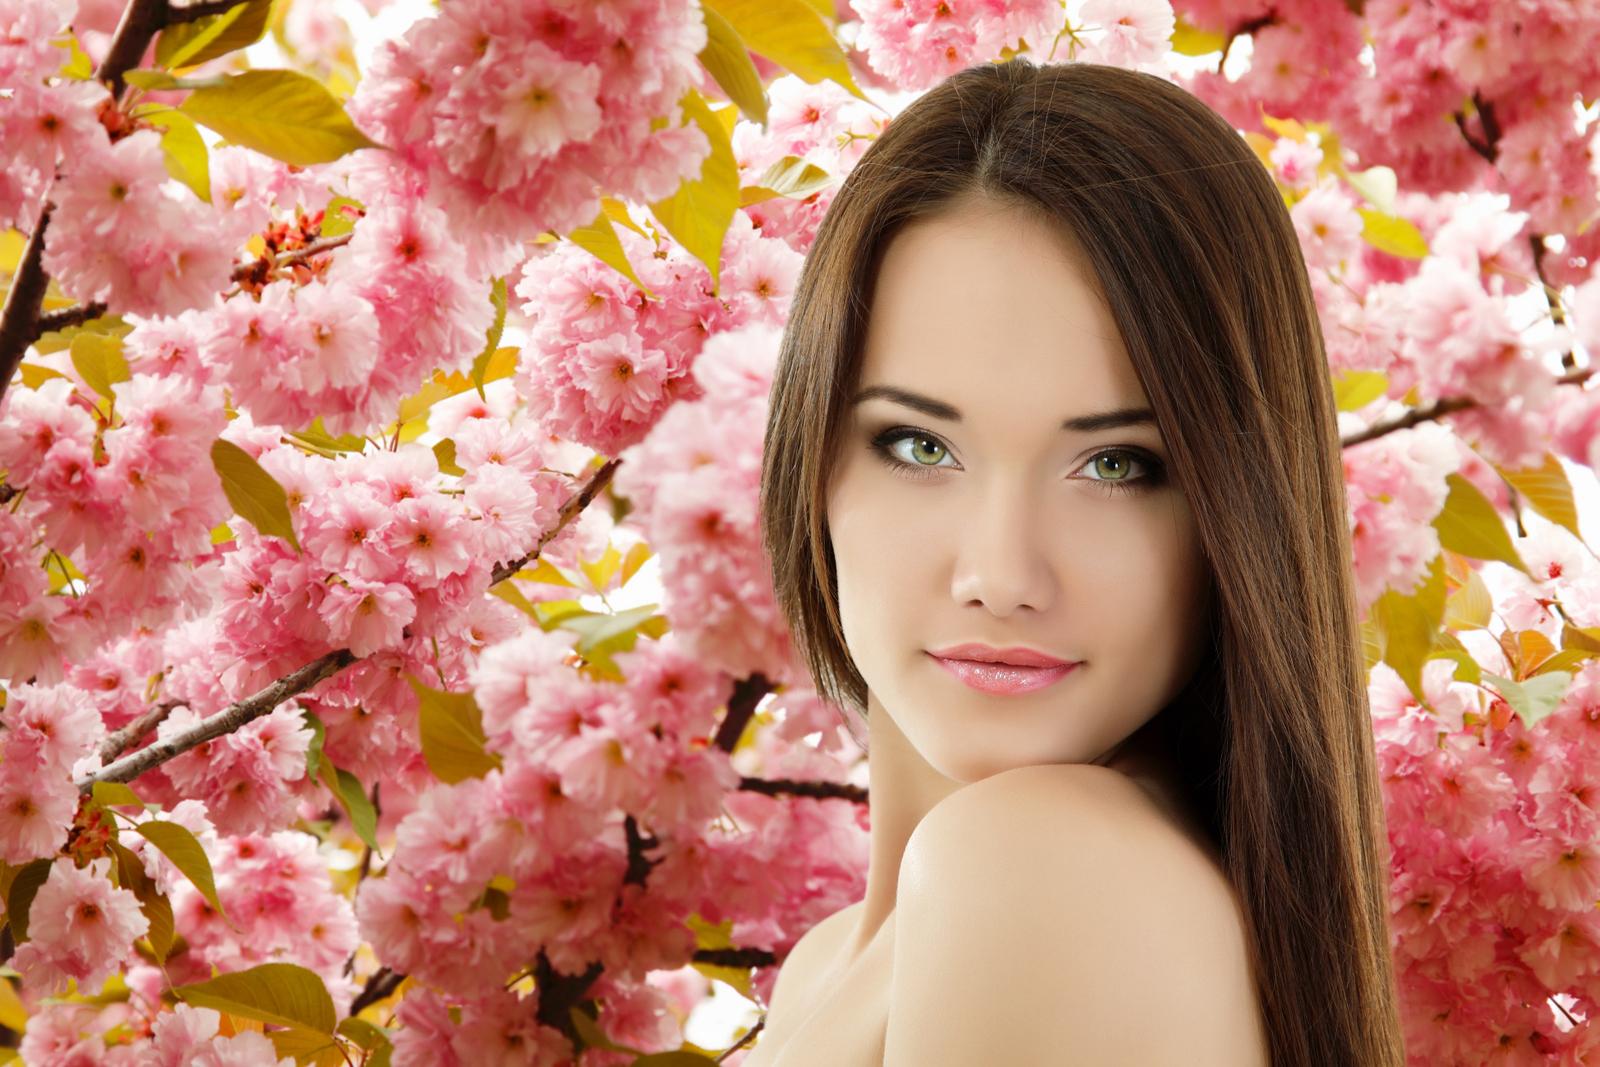 http://1.bp.blogspot.com/-rpmIdv1nYY4/T0Nyqq2paNI/AAAAAAAABEk/5qMJEcA3EbM/s1600/Spring+Lady+Wallpaper_cinemad_70mm+(4).jpg